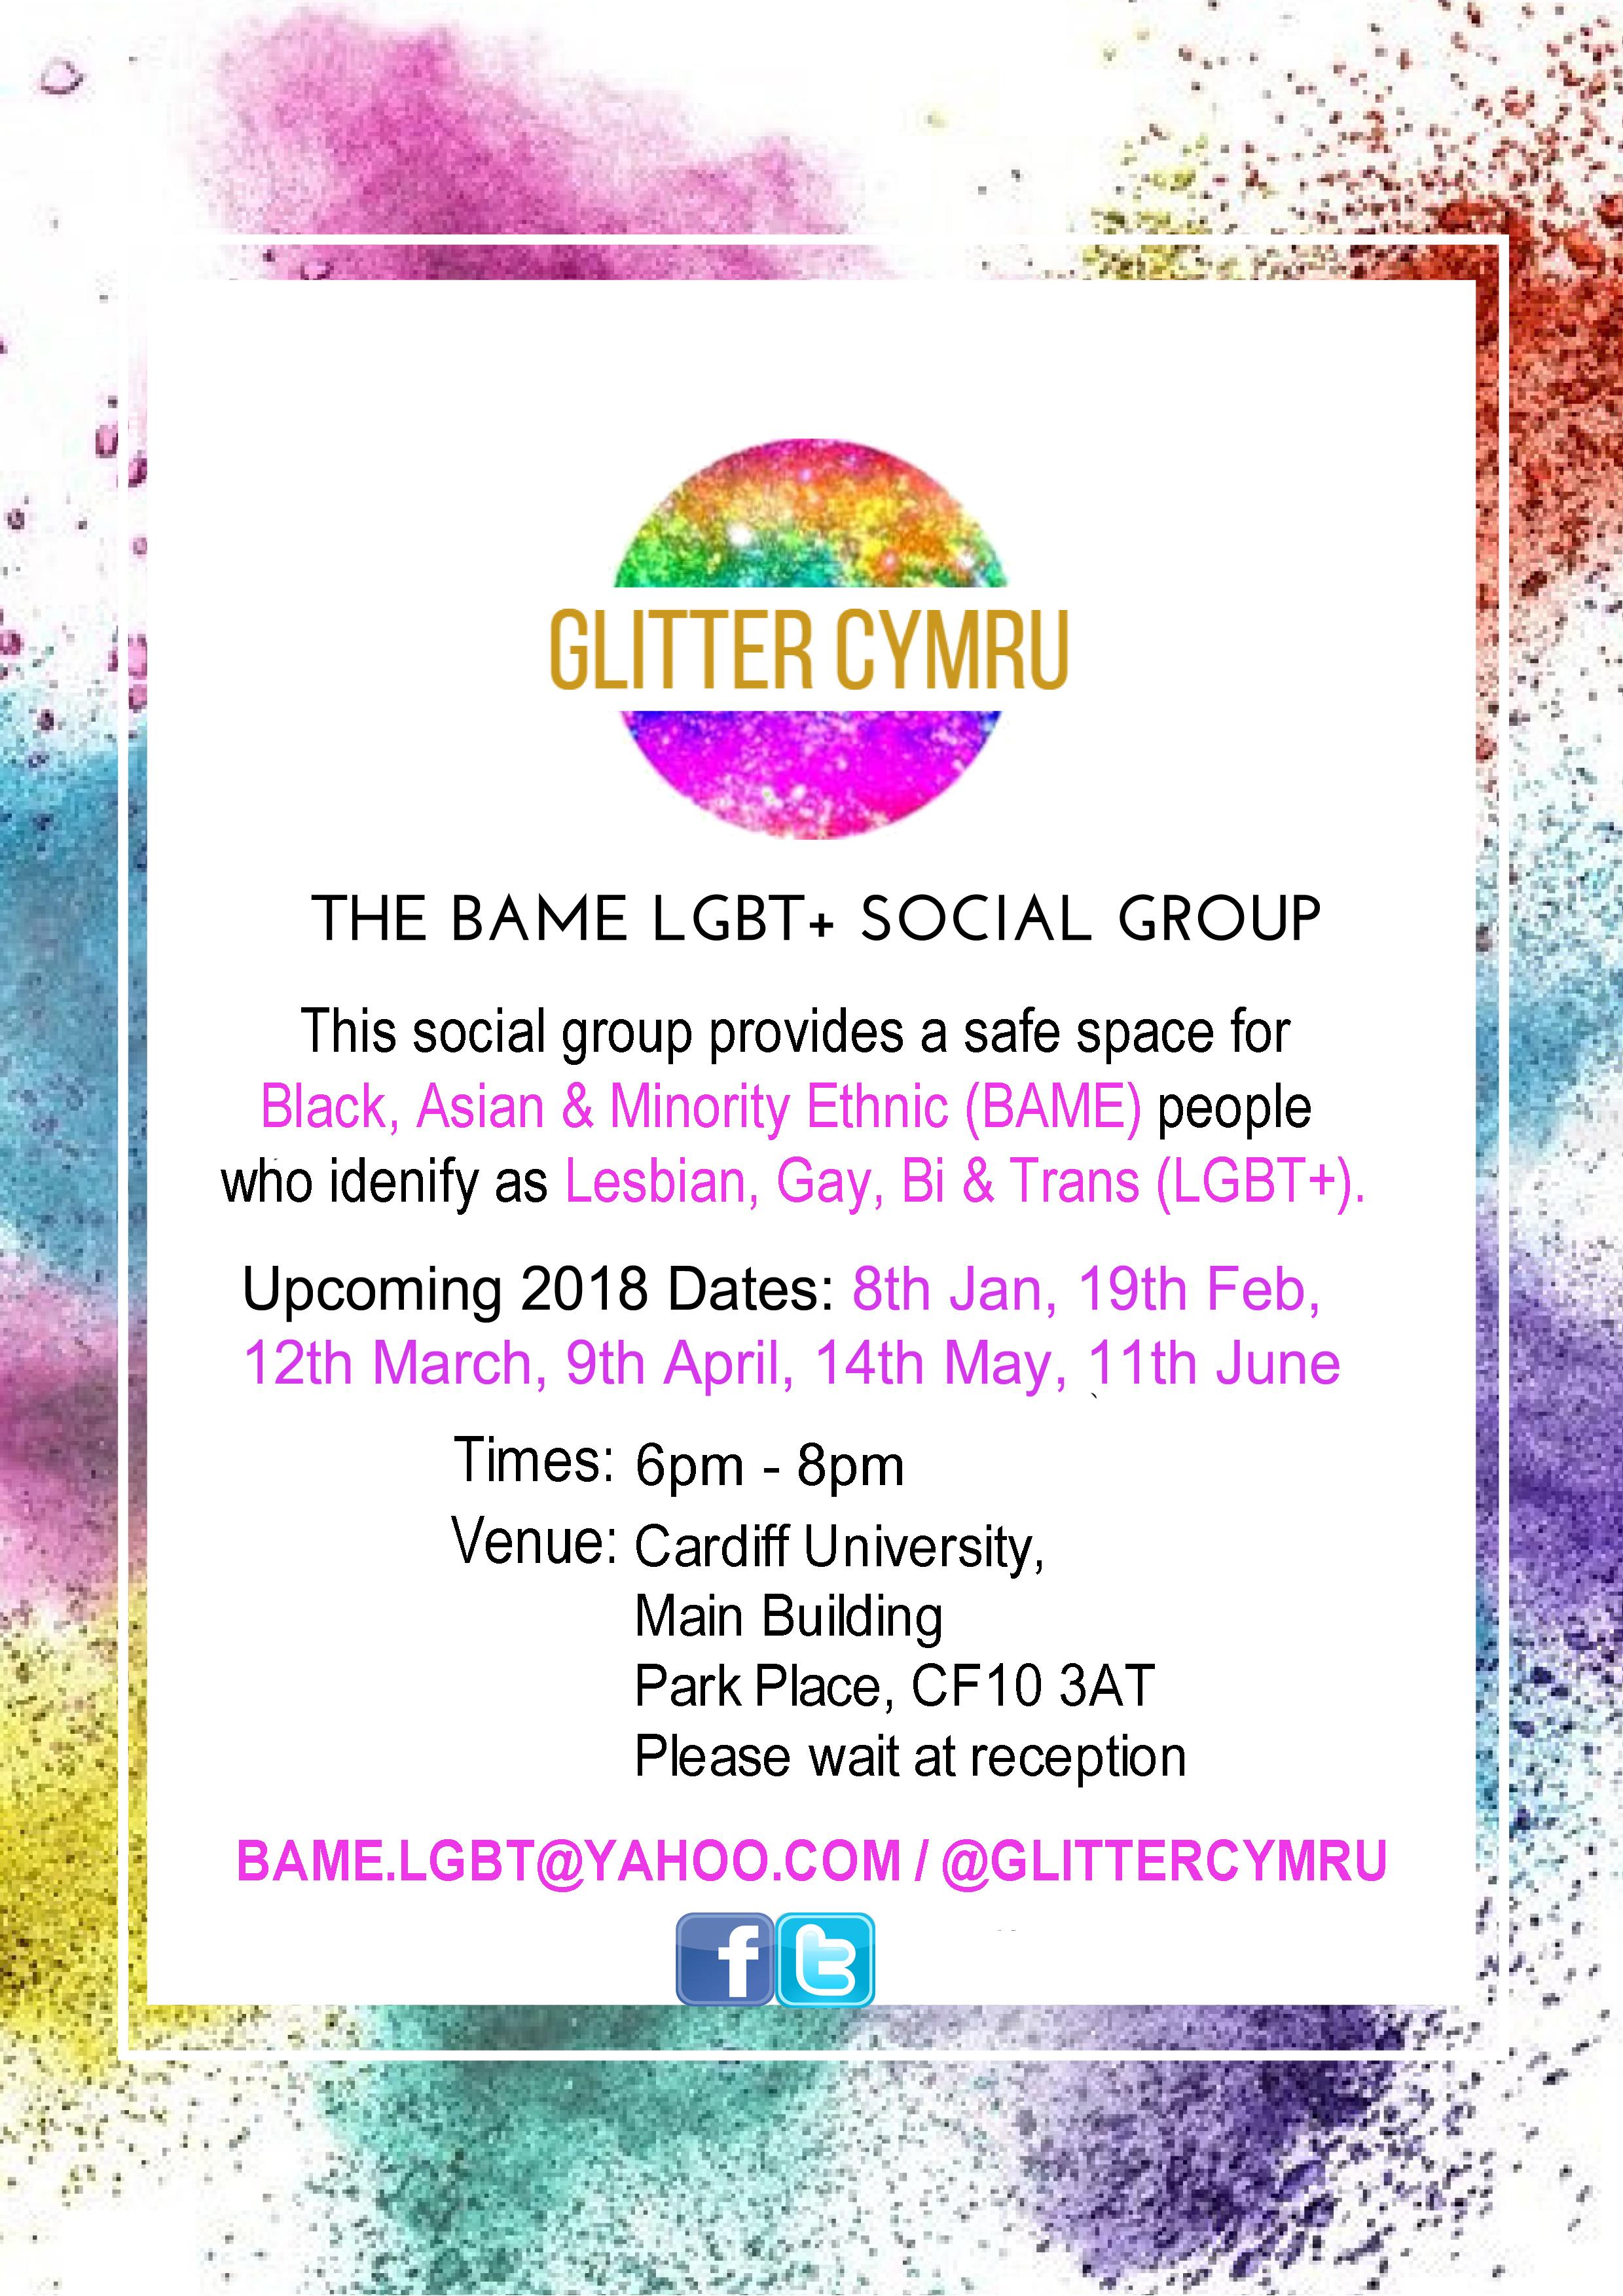 Glitter Cymru 2018 Events.jpg